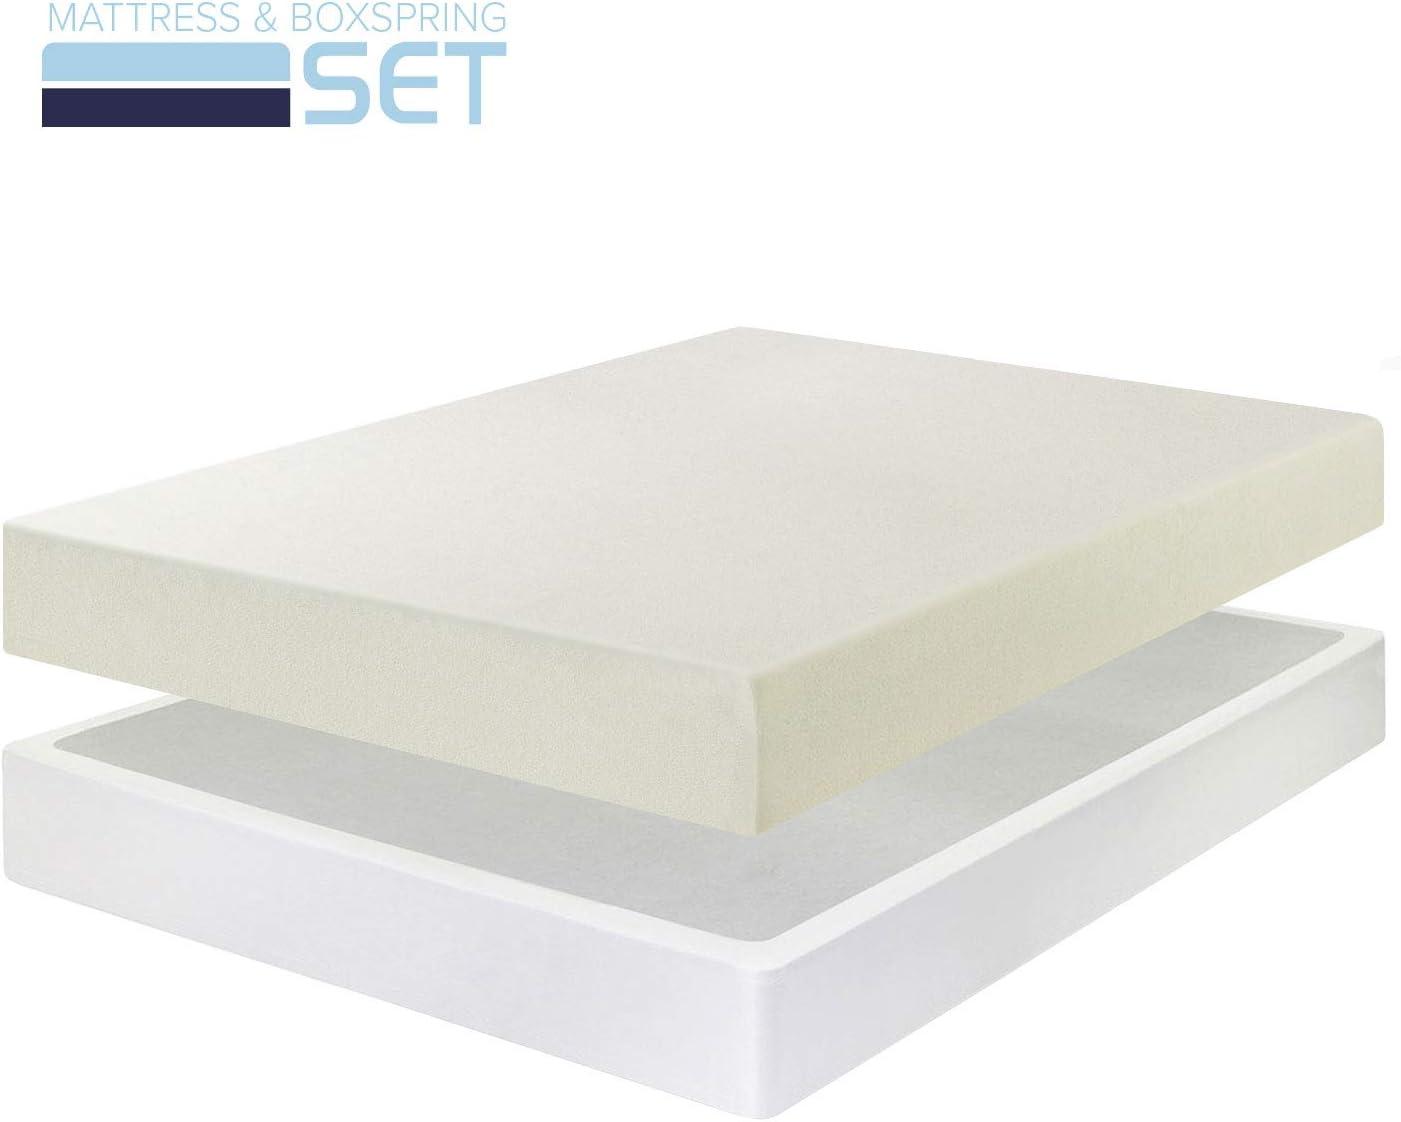 6 Memory Foam Mattress New Innovative Box Spring Set Full Size